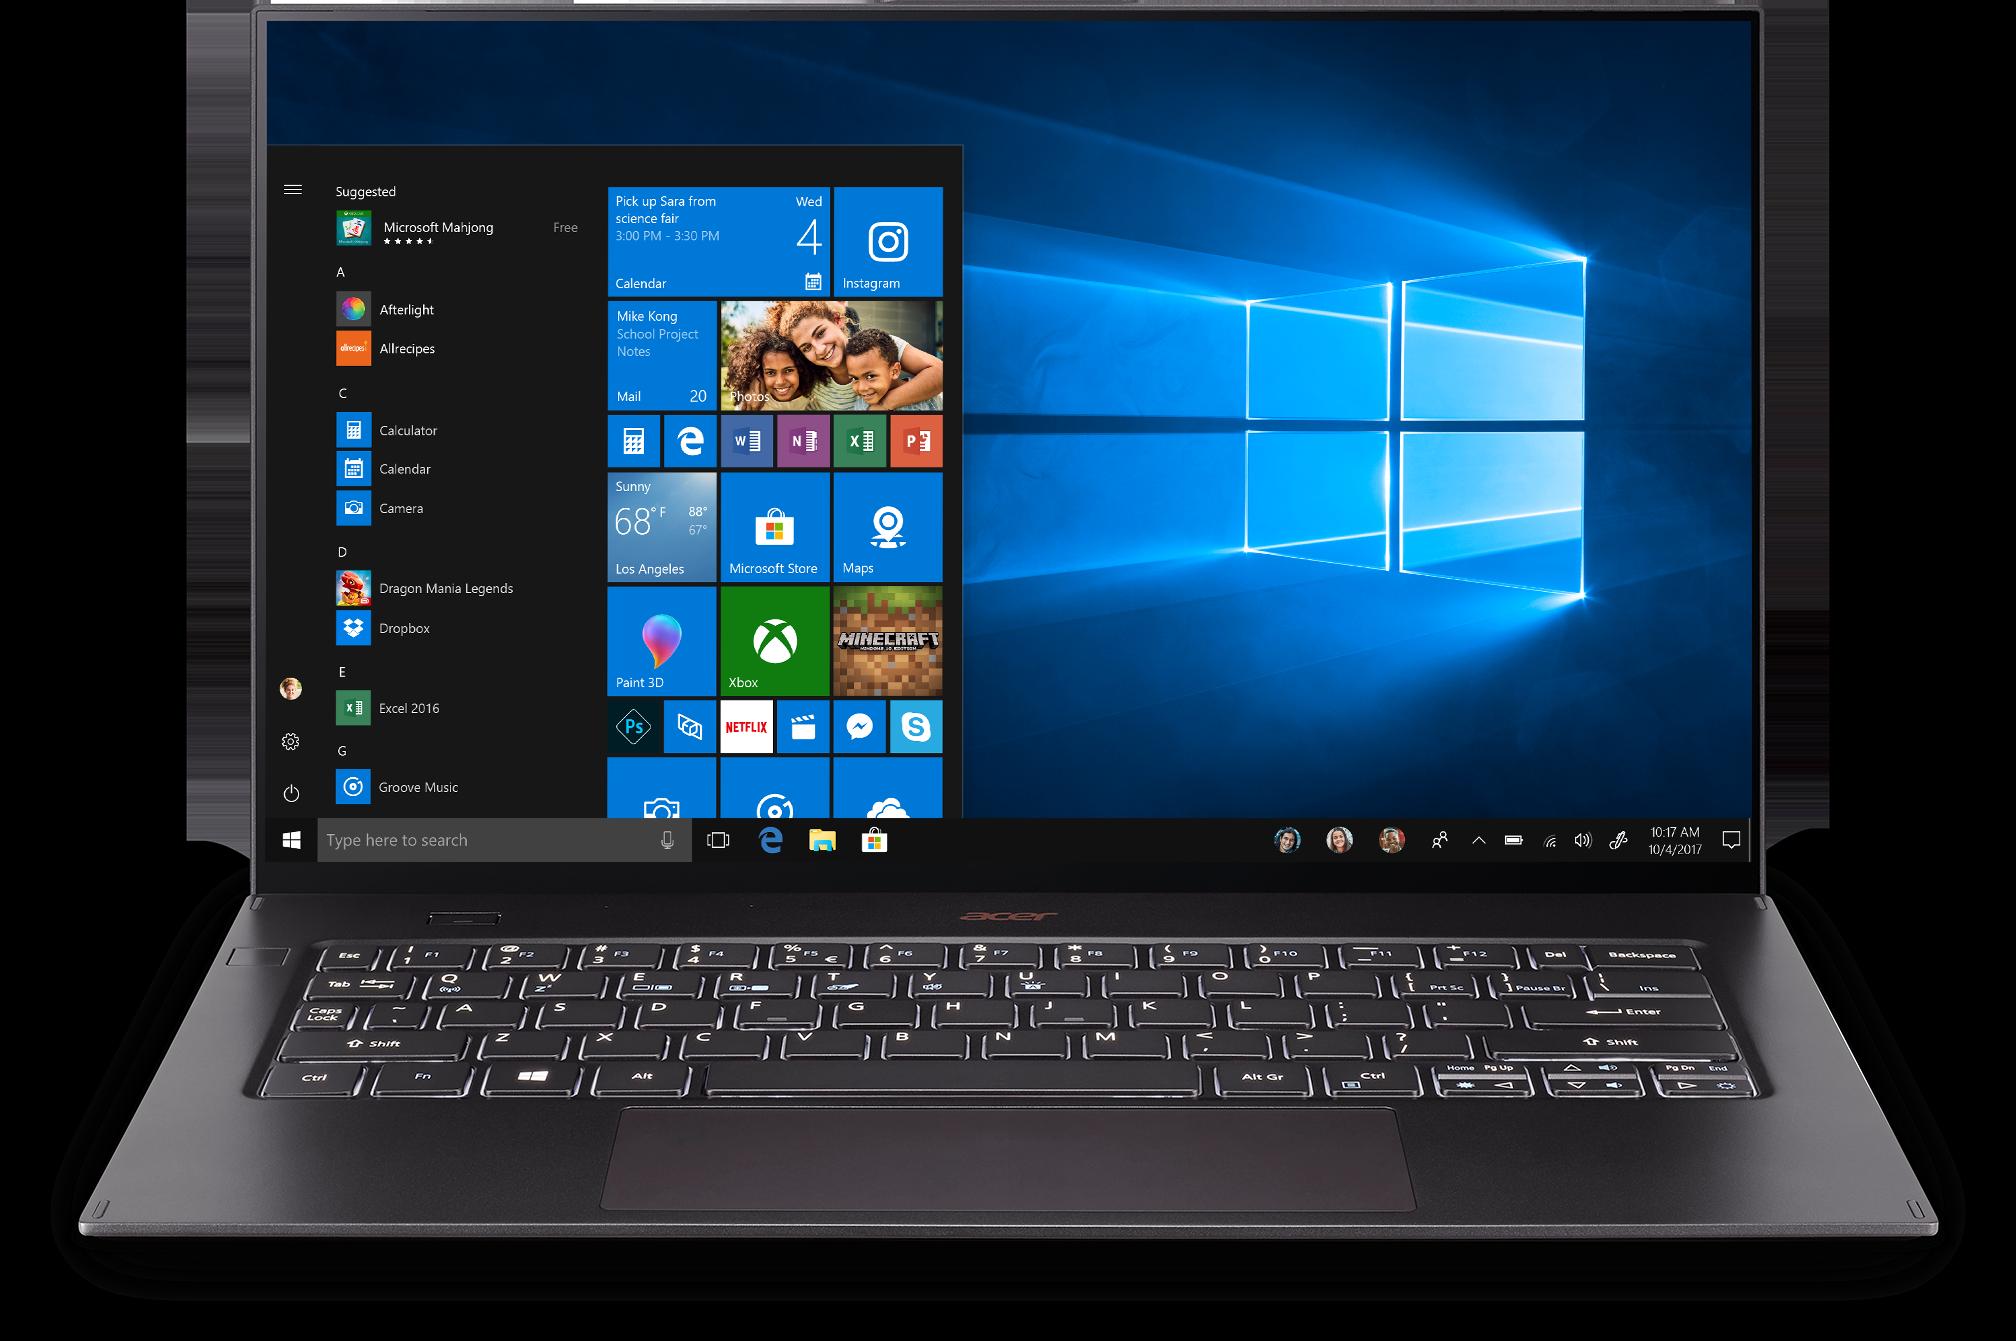 Acer Swift 7 SF714-52T-75R6 Laptop